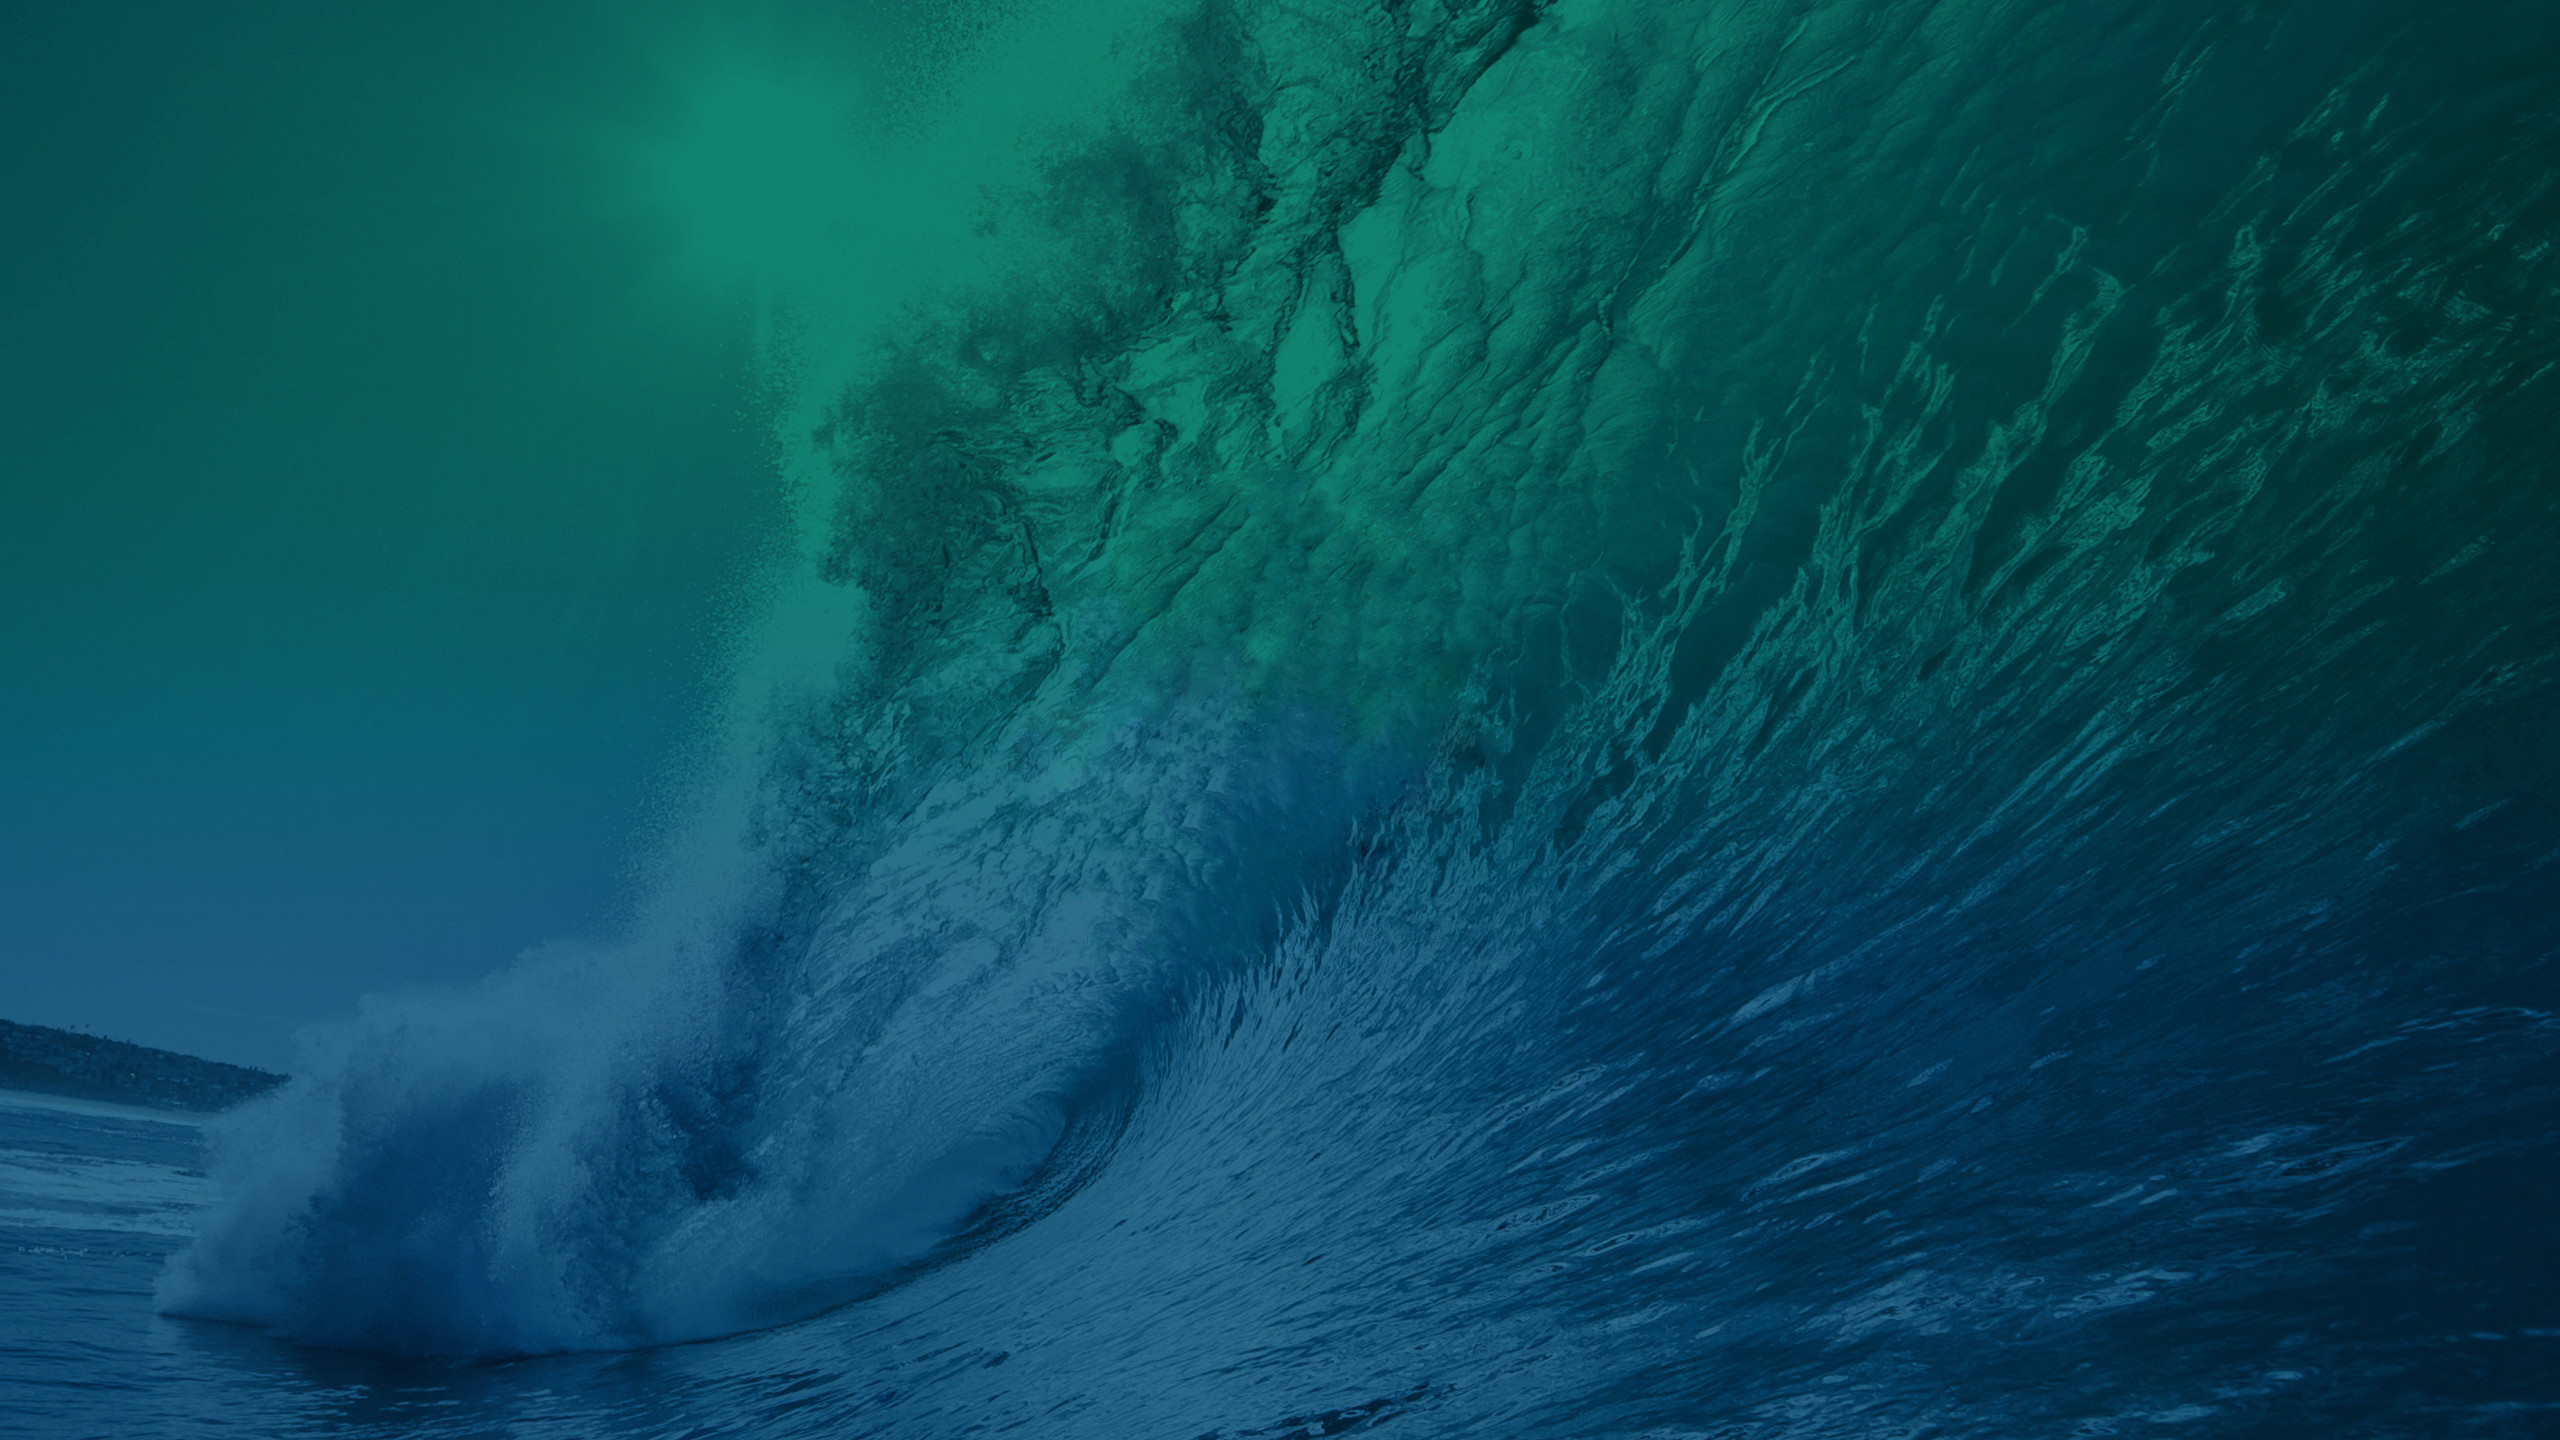 mac desktop wallpaper (66+ images)